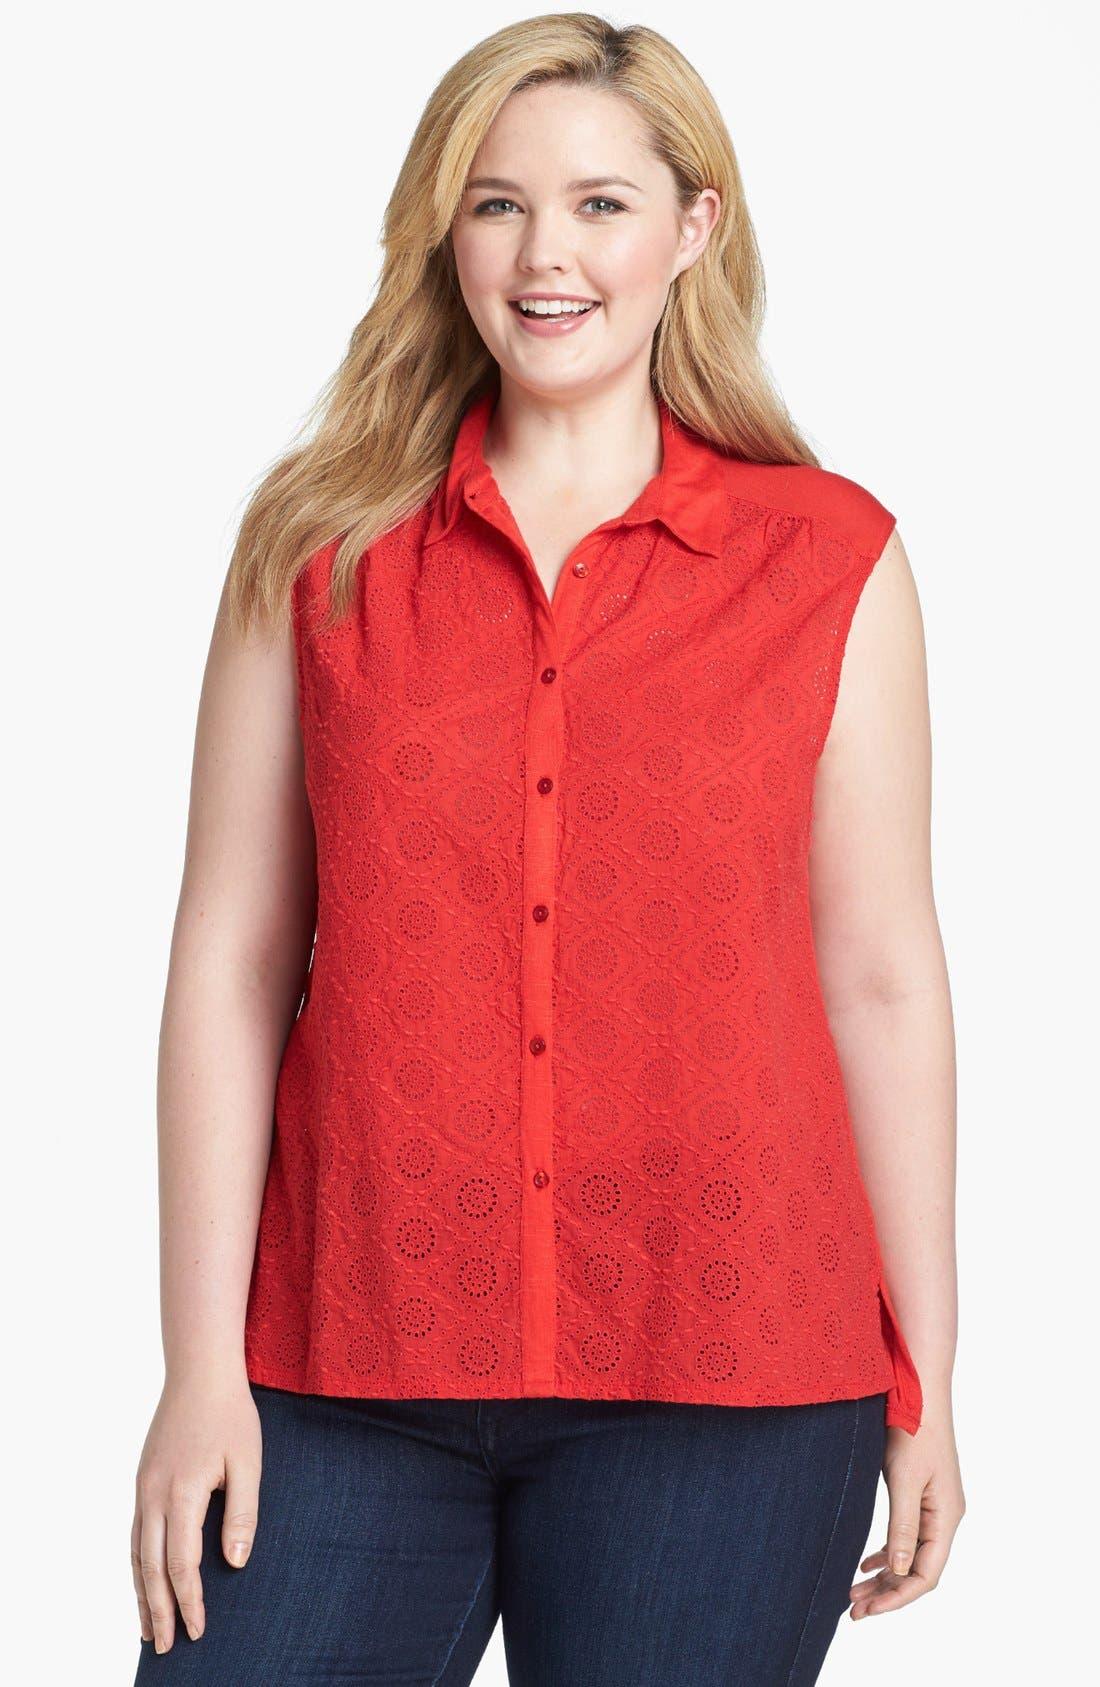 Alternate Image 1 Selected - Lucky Brand 'Vivianne' Sleeveless Eyelet Shirt (Plus Size)